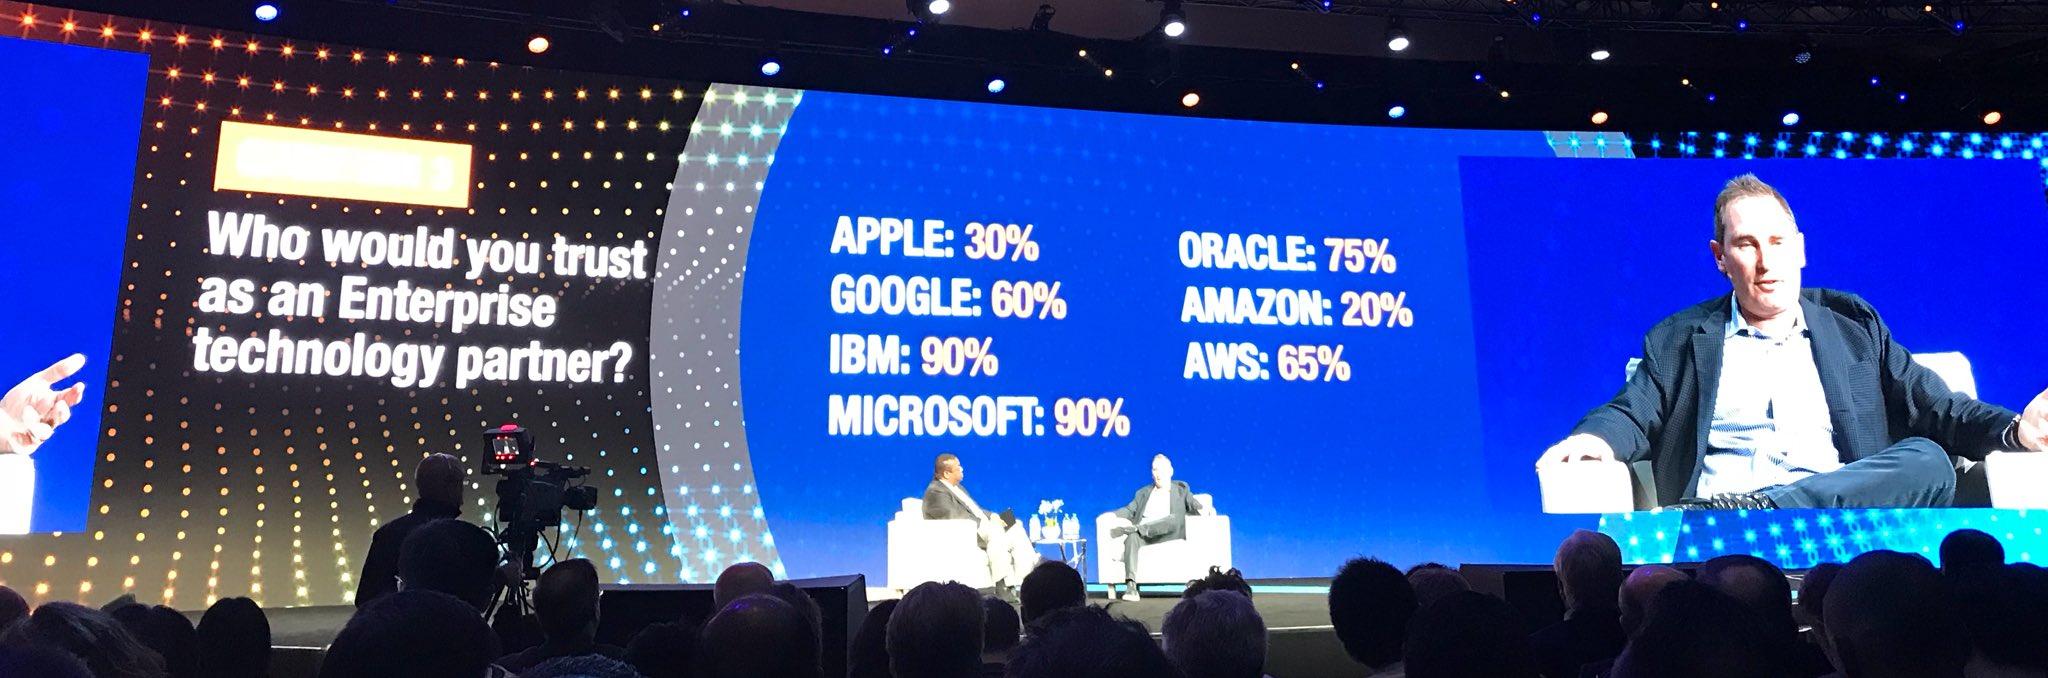 Microsoft shining on AWS, in presence of AWS CEO 😛😁😁 #GarterSYM #Microsoft #AzureStack https://t.co/oaPSHU524q